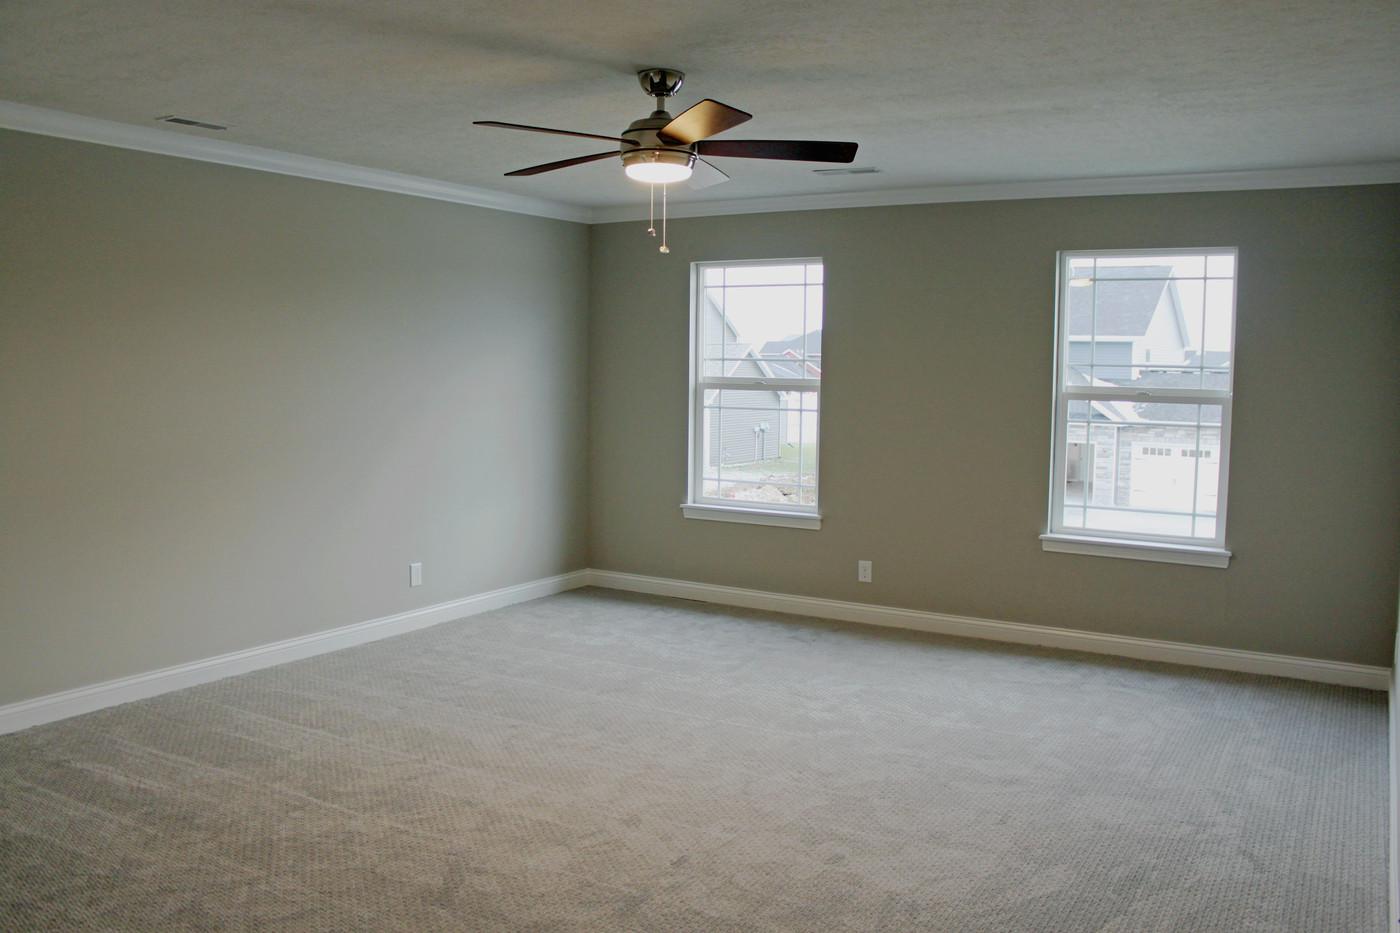 2866 Needletail Master Bedroom